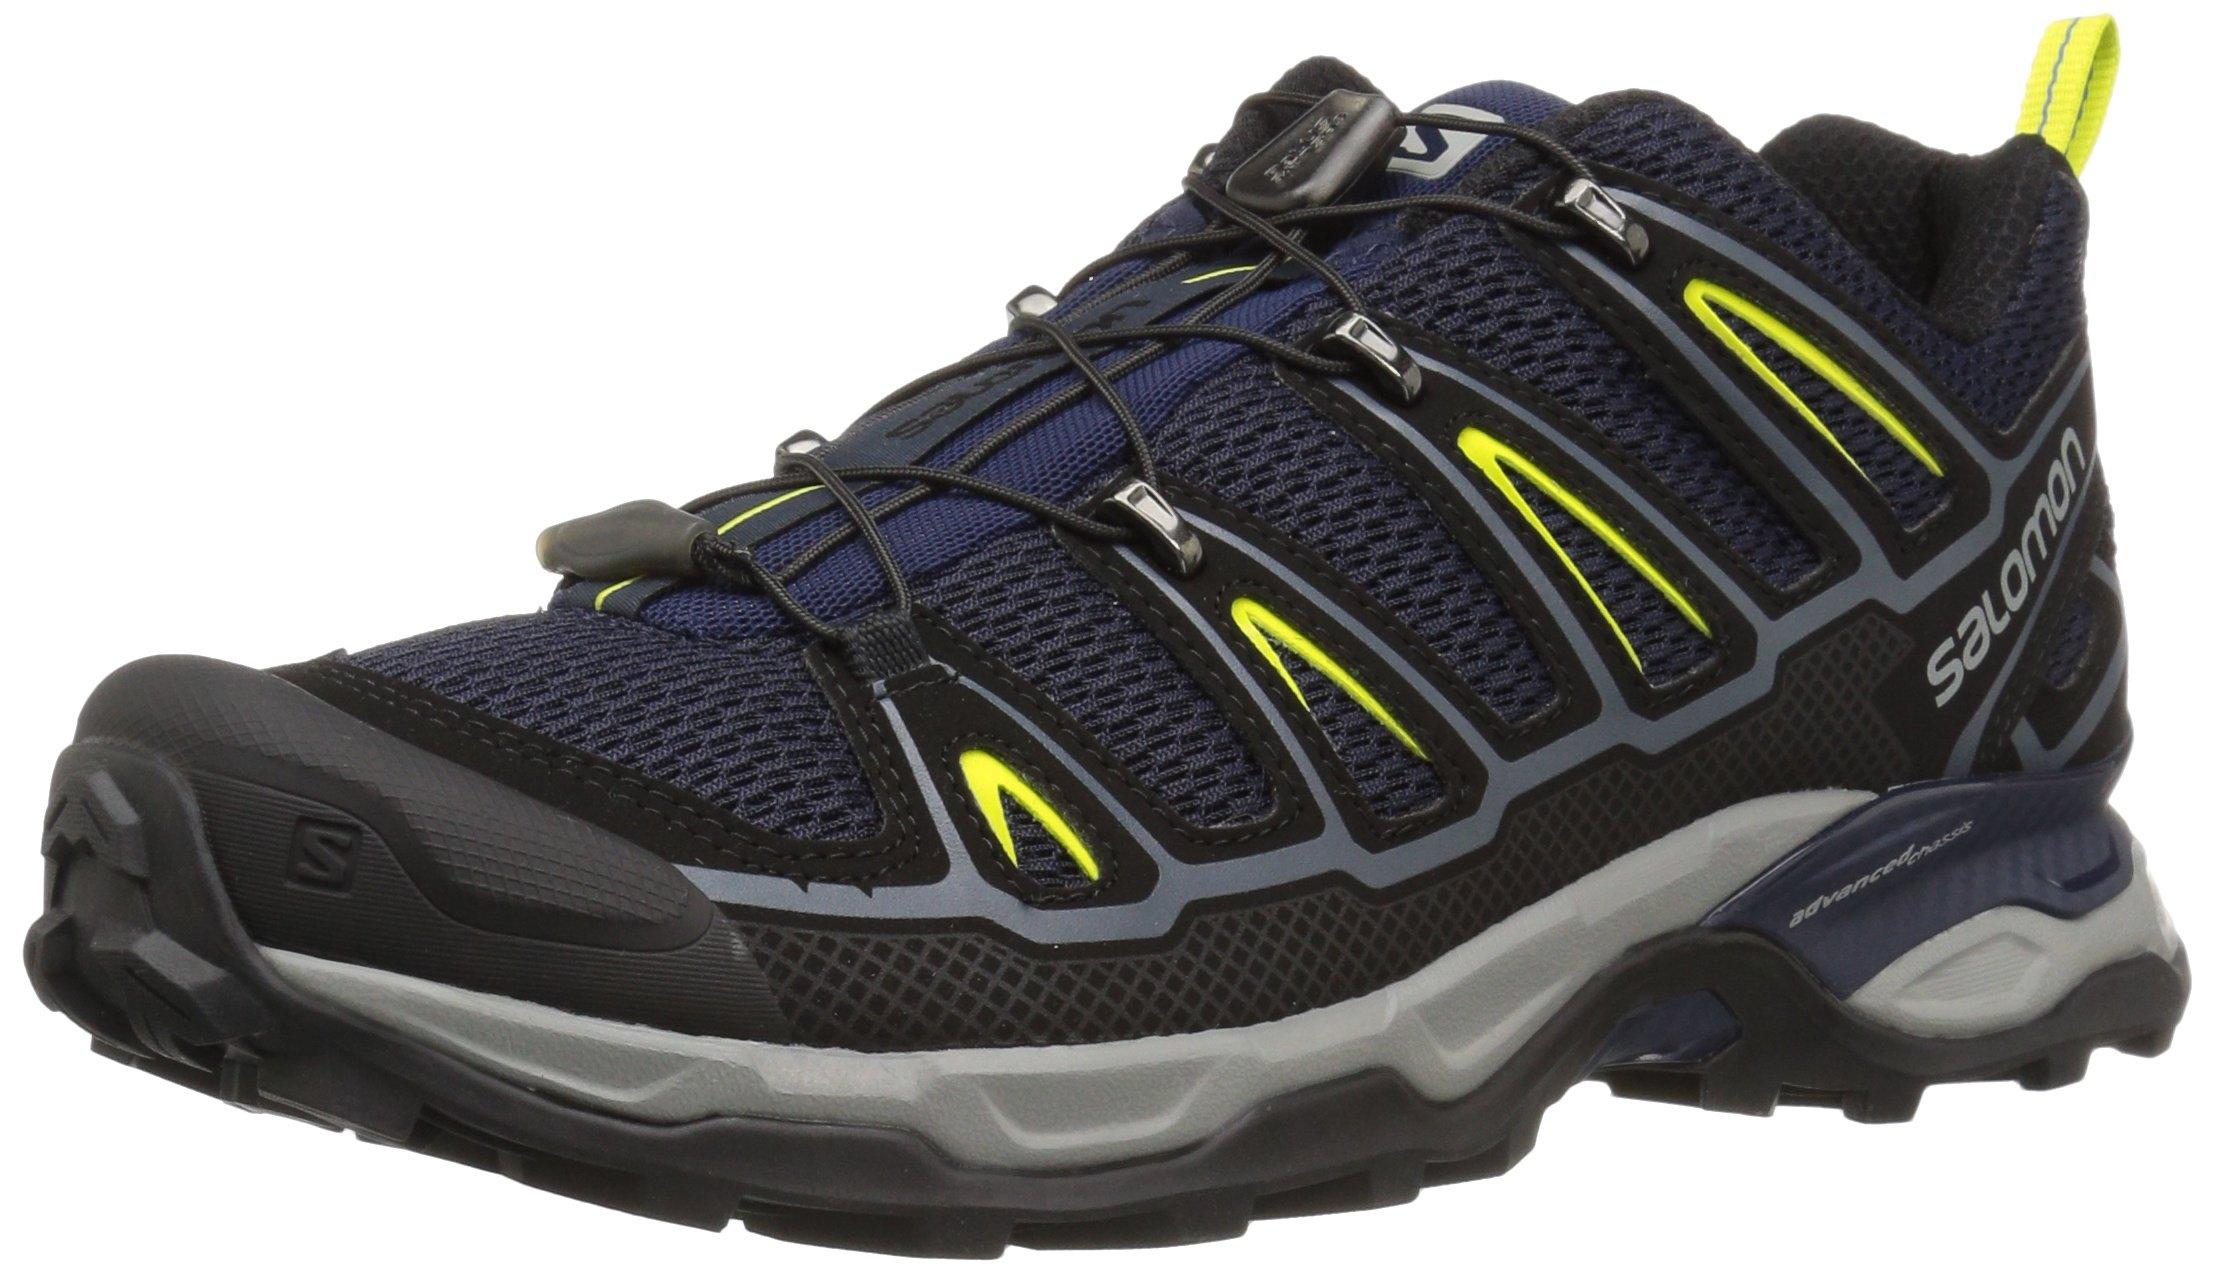 Salomon Men's X Ultra 2 Hiking Shoe, Navy Blazer/Ombre Blue/Sulphur Spring, 10 D US